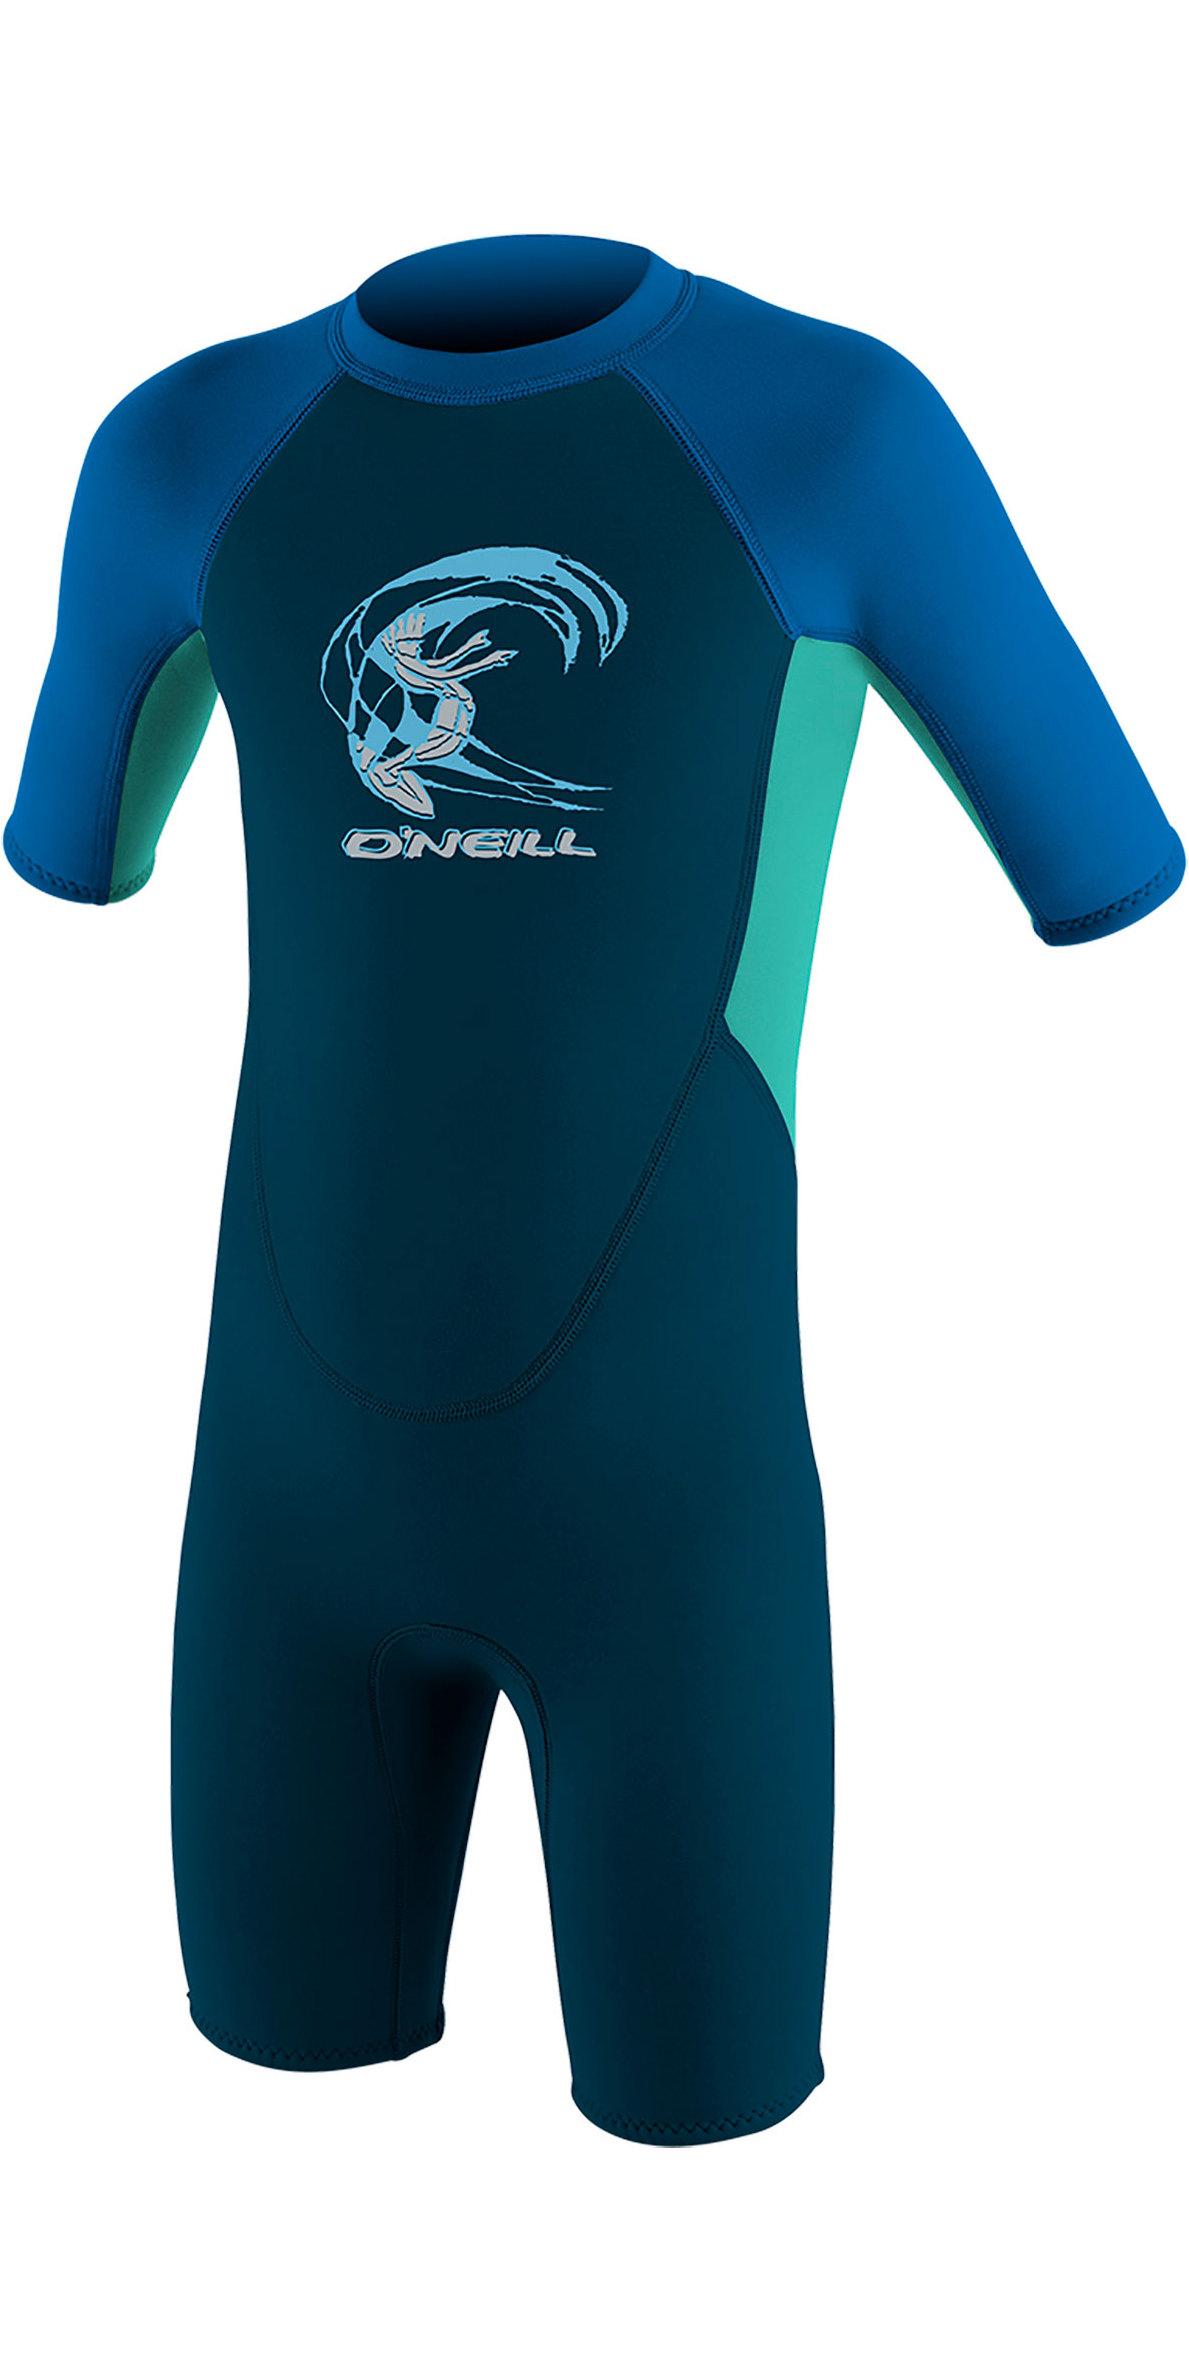 fdda3a108c 2019 O'Neill Toddler Reactor 2mm Back Zip Shorty Wetsuit Slate / Aqua /  Ocean 4867